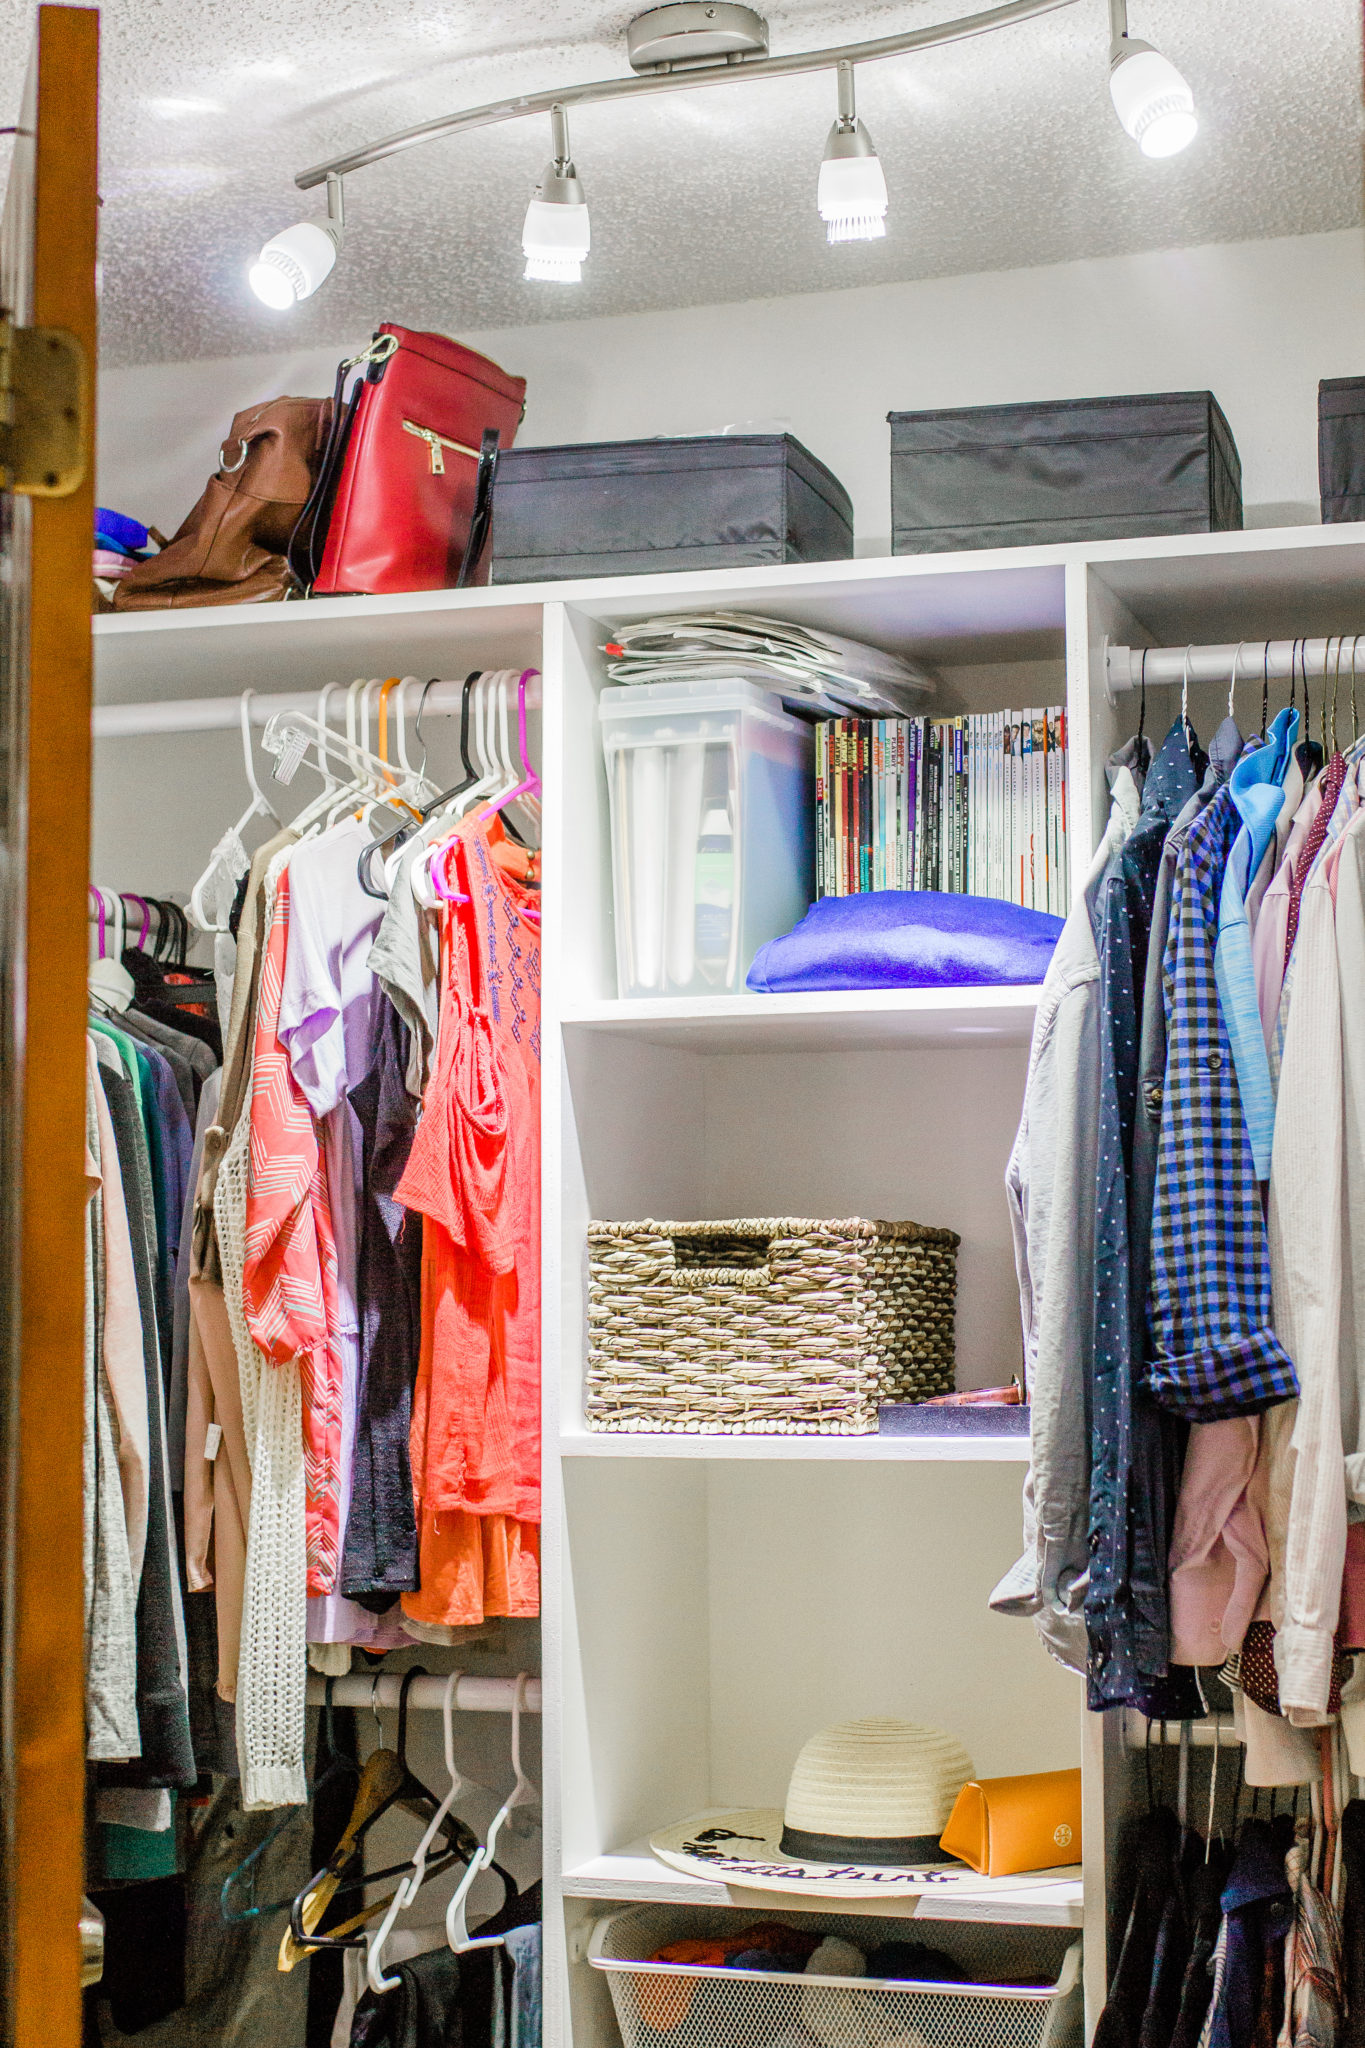 #ad #mariekondoxcaclosets How to Maximize Your Closet Space with California Closets and the KonMari method